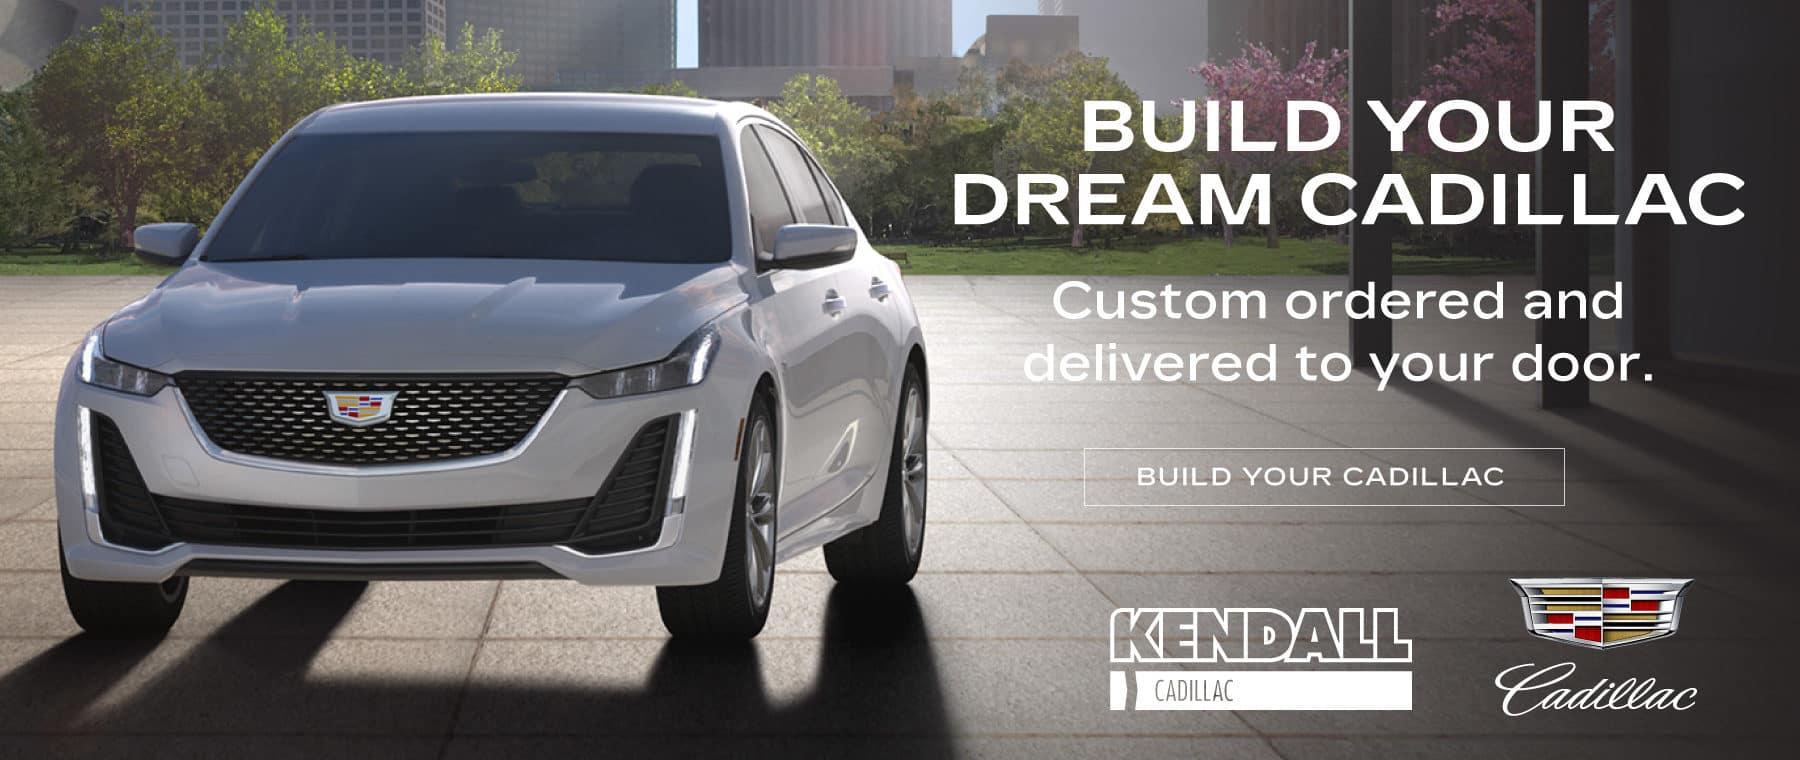 17960-KenAut-Sep21-Custom-Order-Vehicle-Web-Banners-CADI-EUGENE